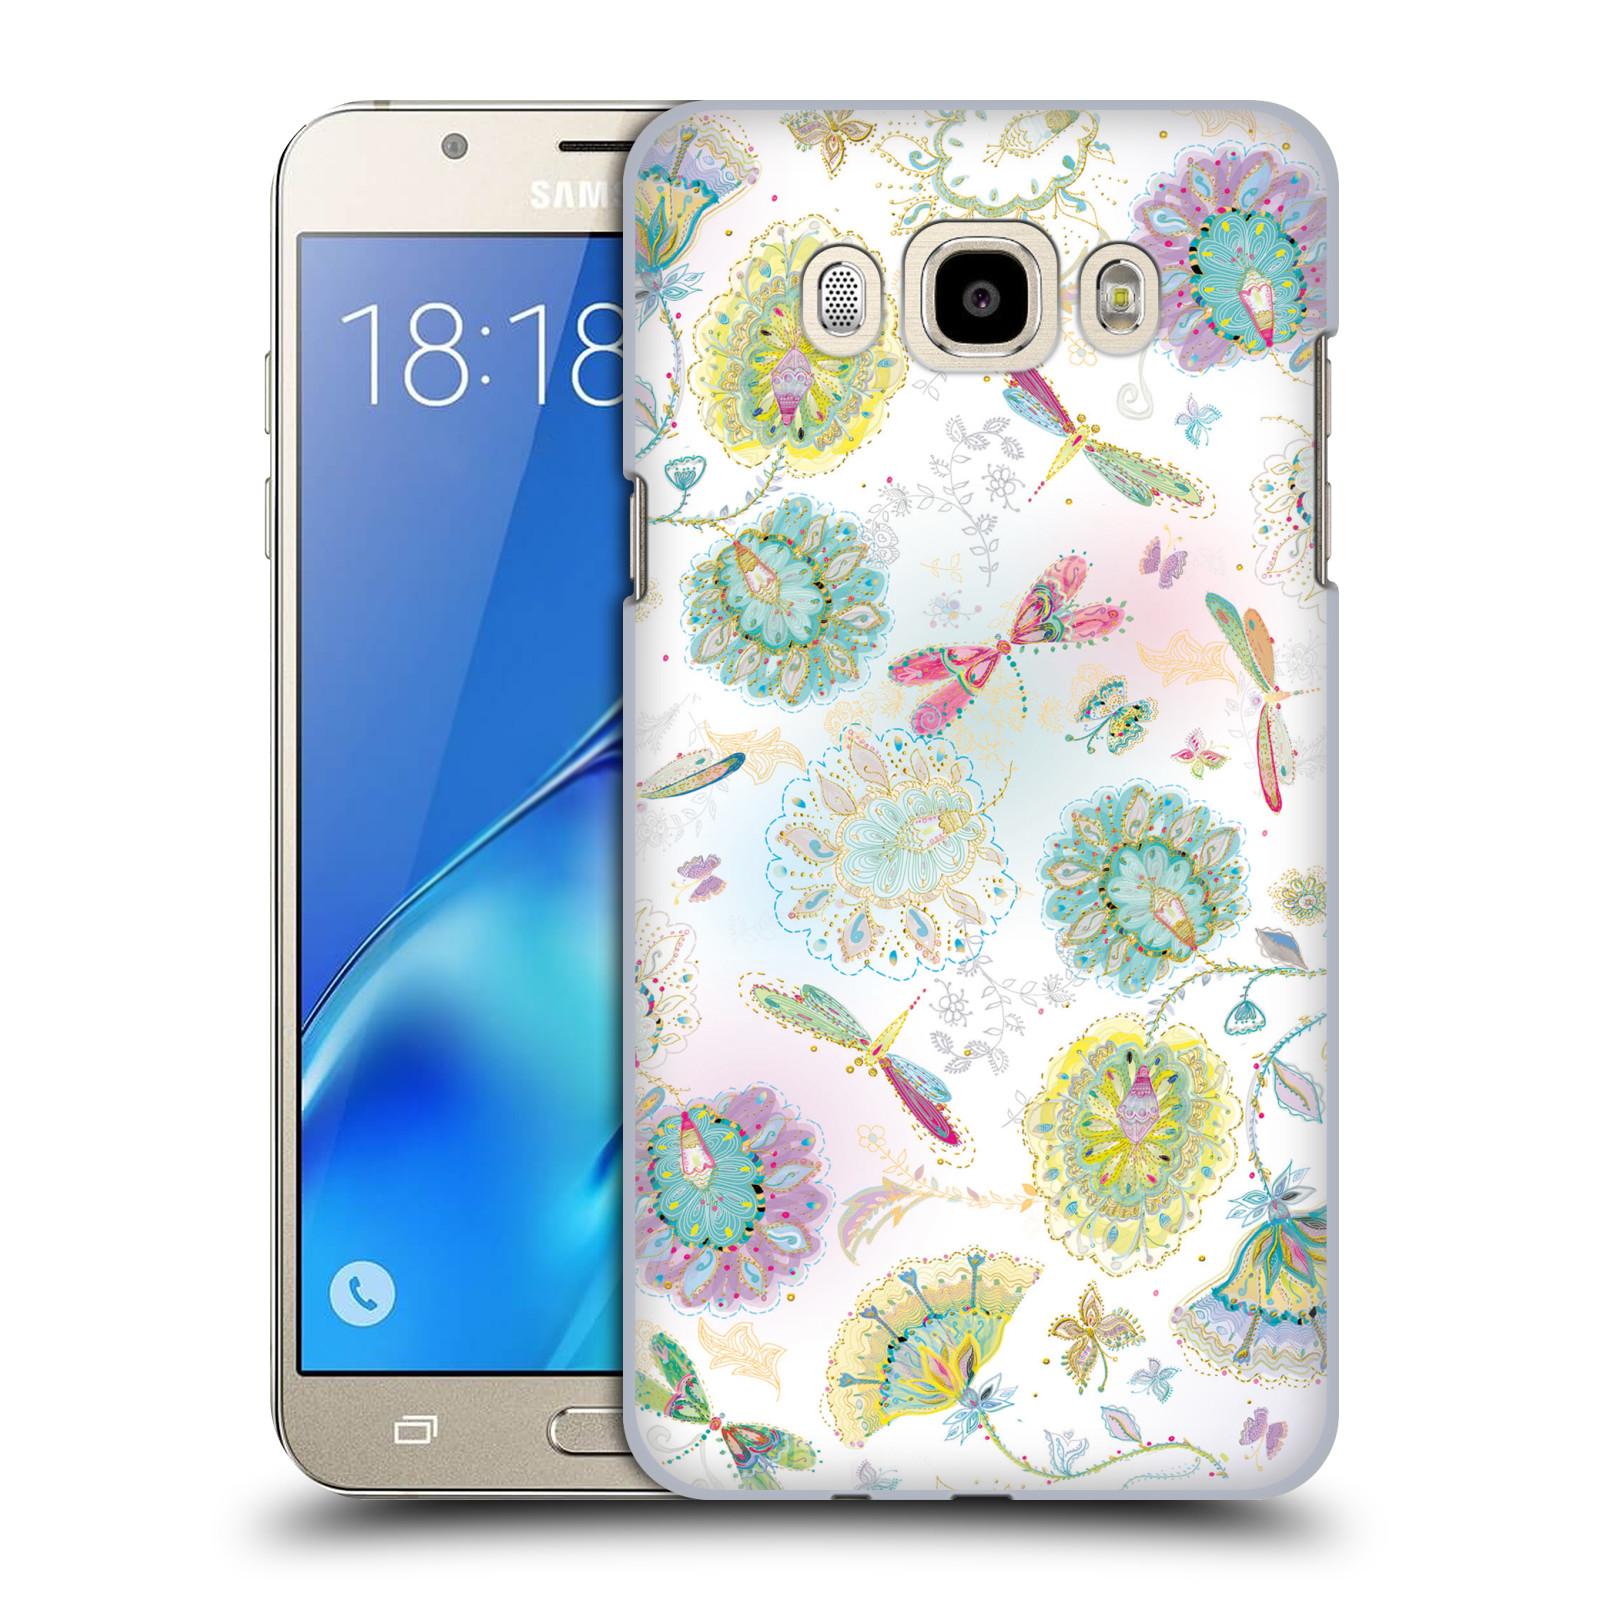 UFFICIALE-turnowsky-Silver-Moon-HARD-BACK-CASE-per-Samsung-Telefoni-3